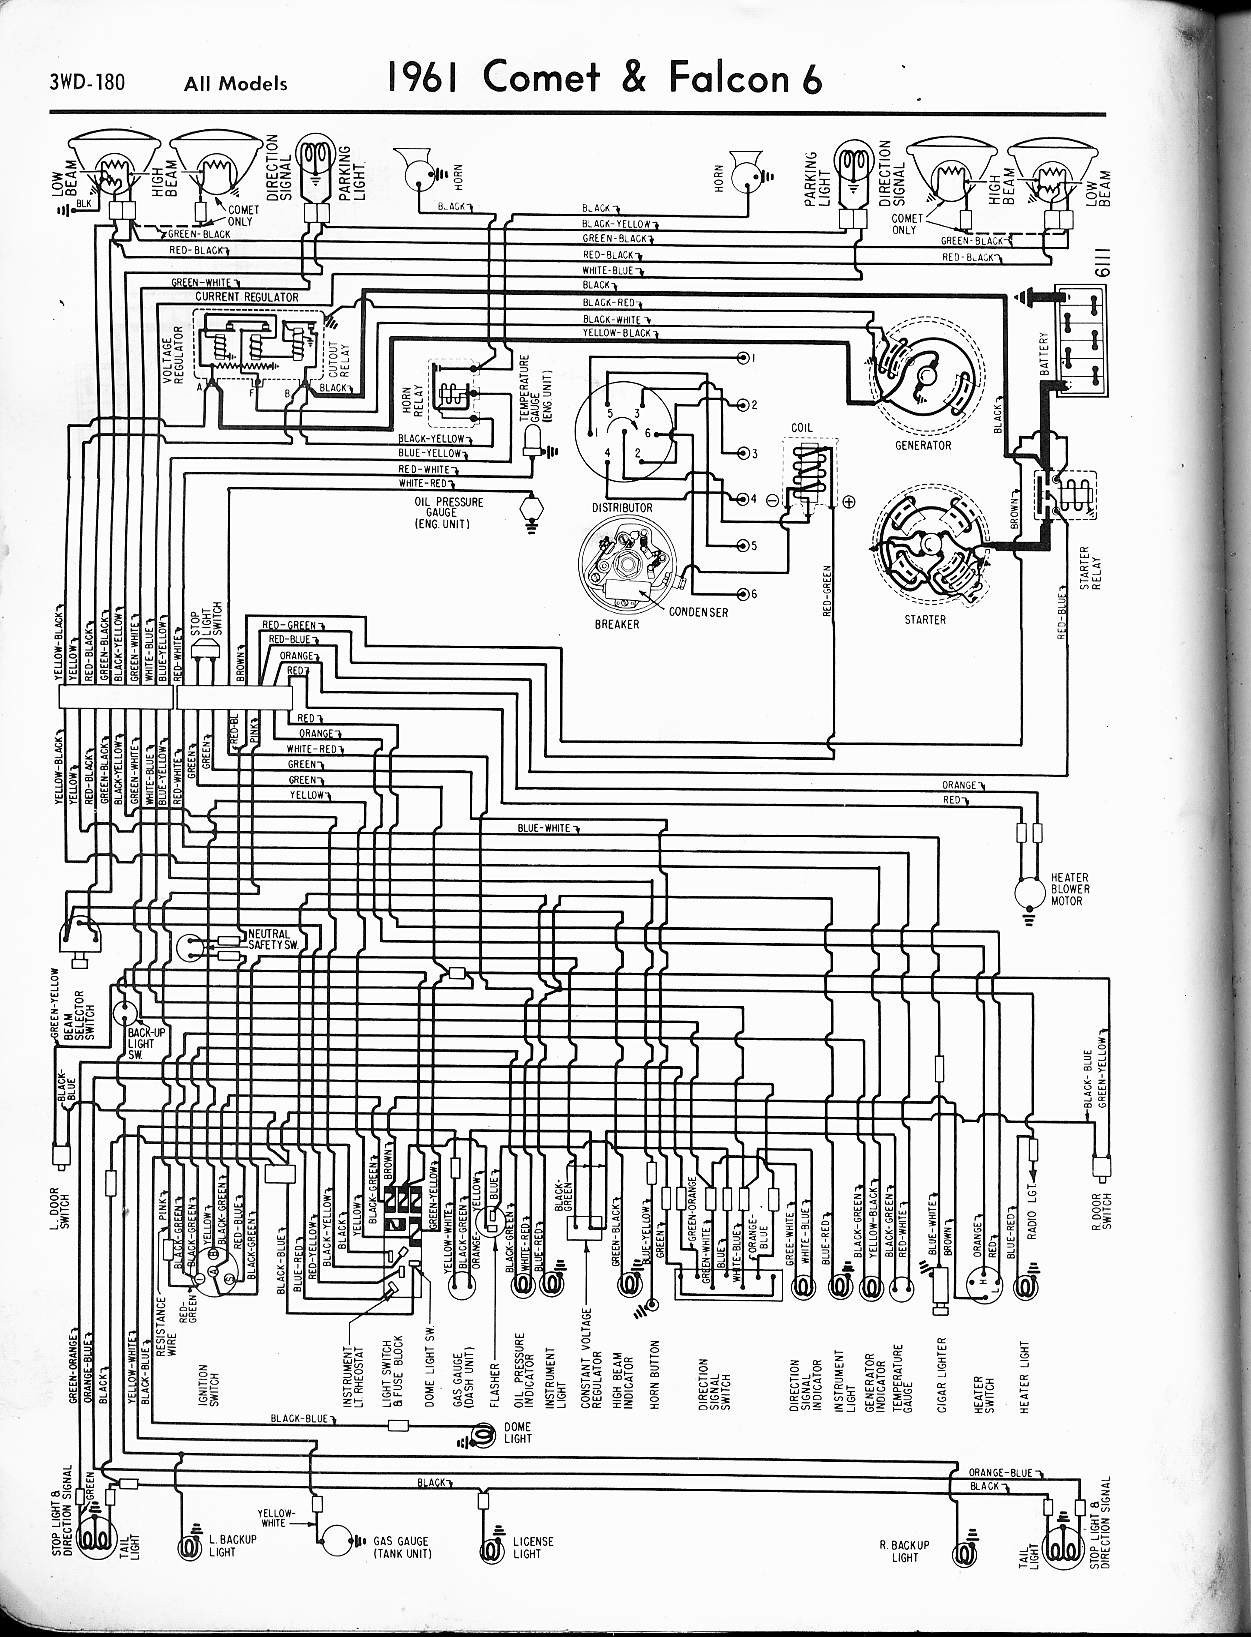 12 Volt Cigarette Lighter Socket Wiring Diagram Solutions Cigar 2004 For 1963 Simple Electronic